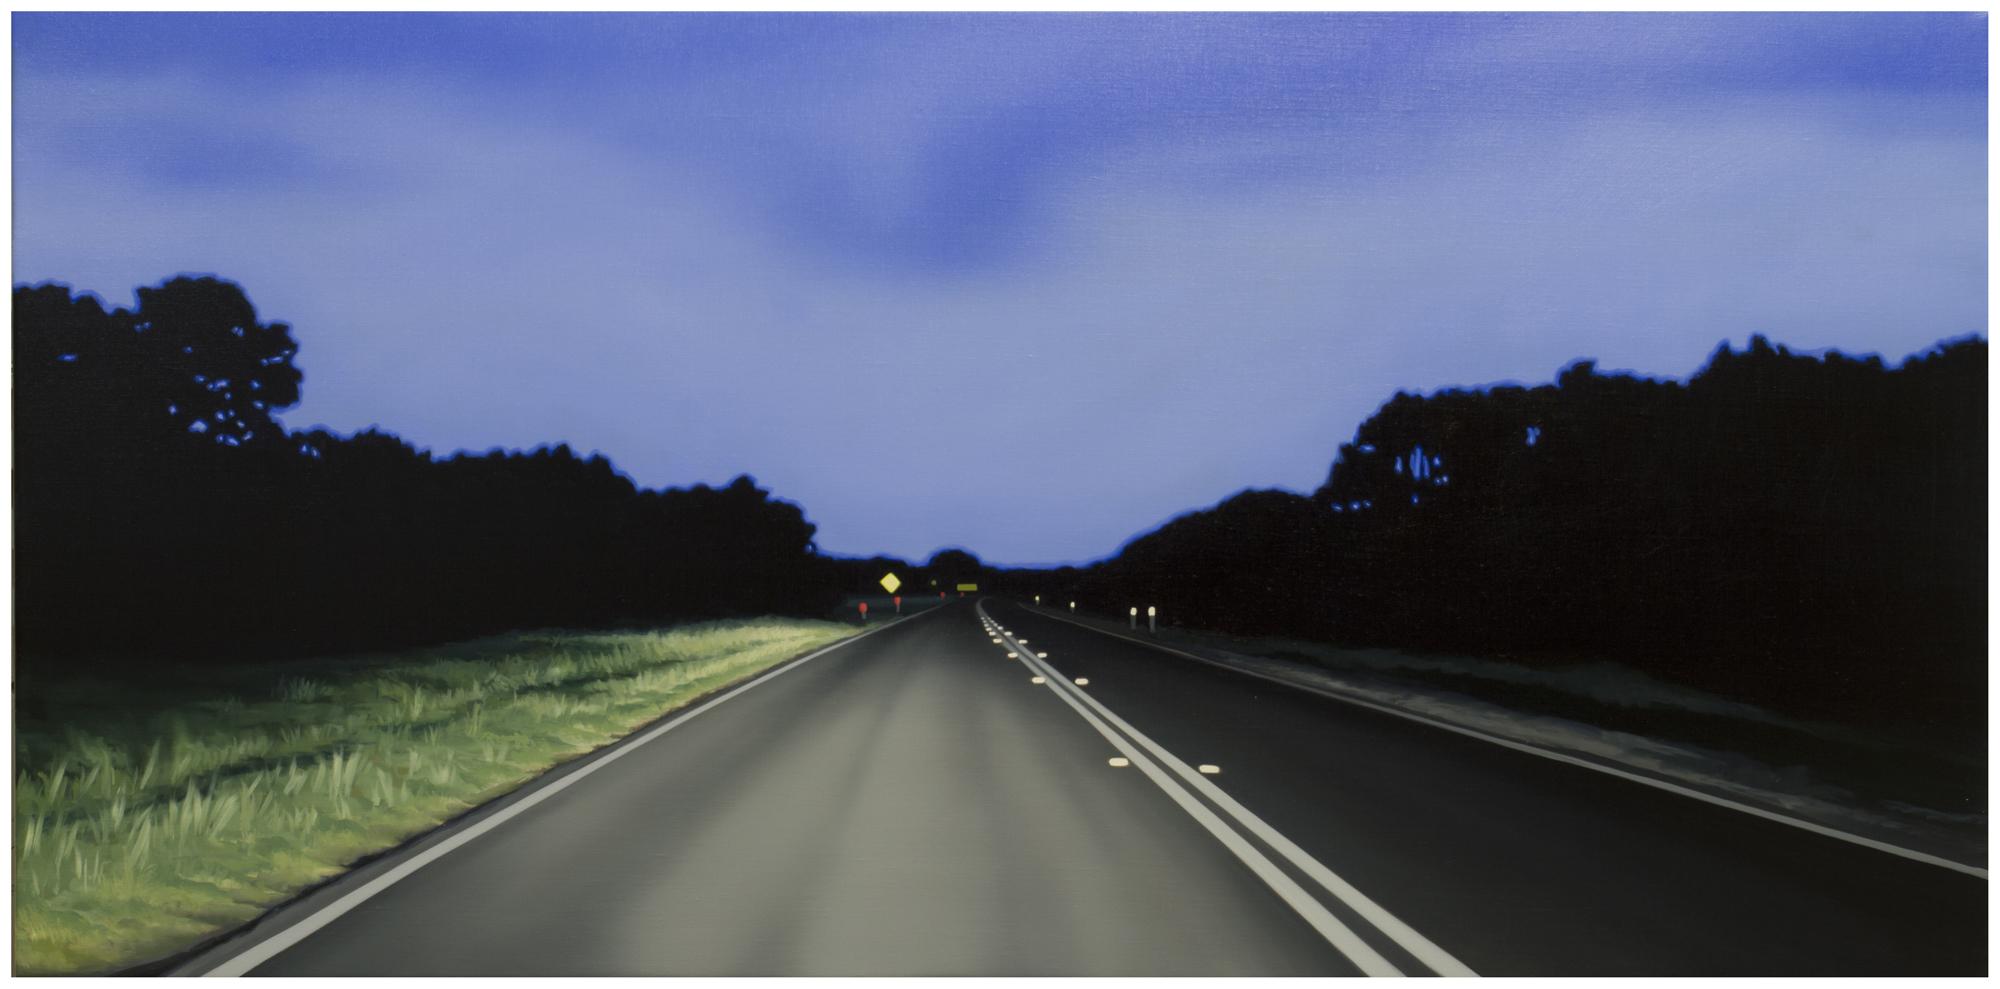 TONY LLOYD  Parallel lines  2014 oil on linen 61 ×122 cm